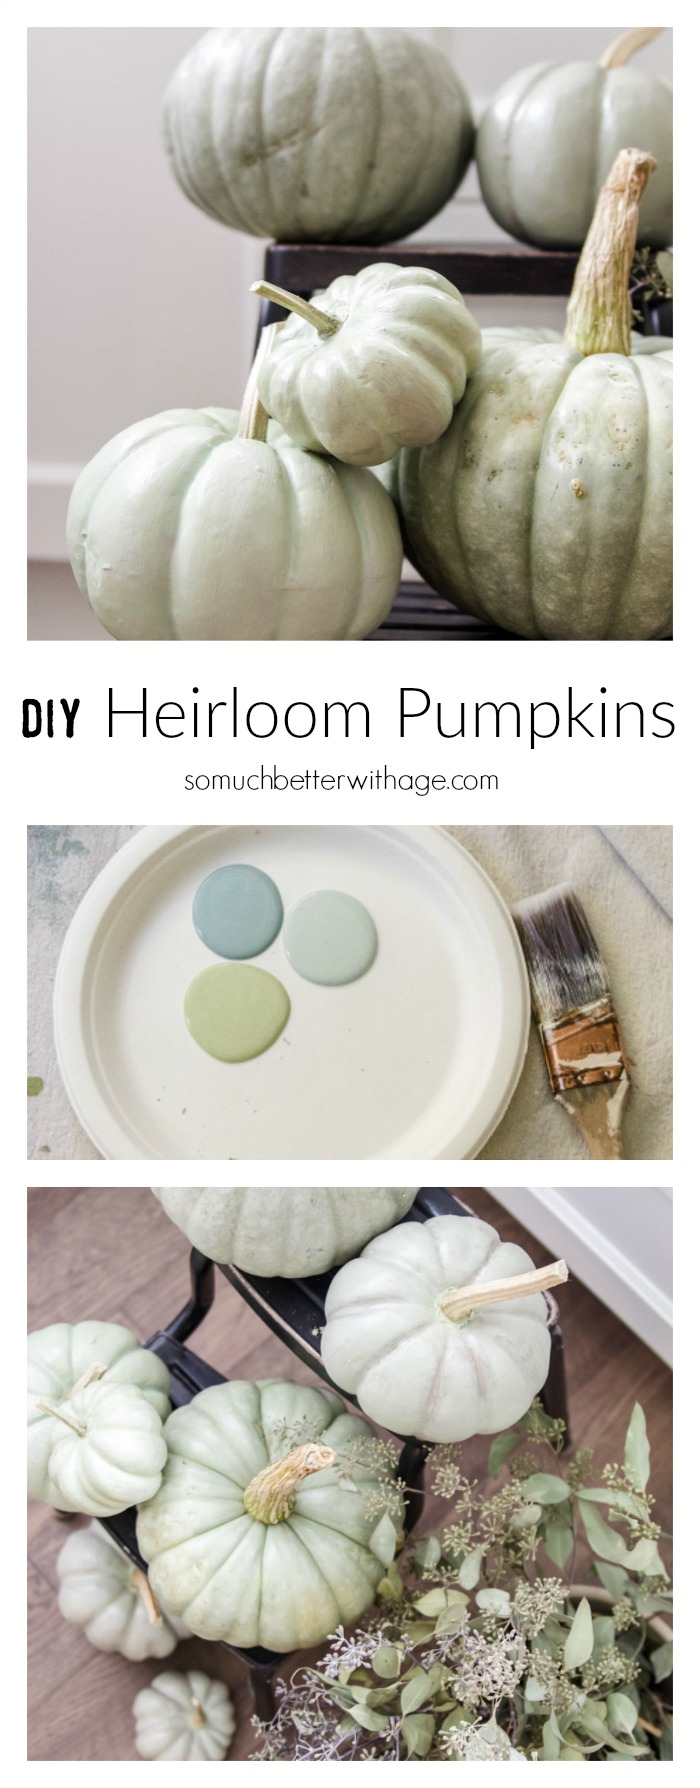 DIY heirloom pumpkin tutorial